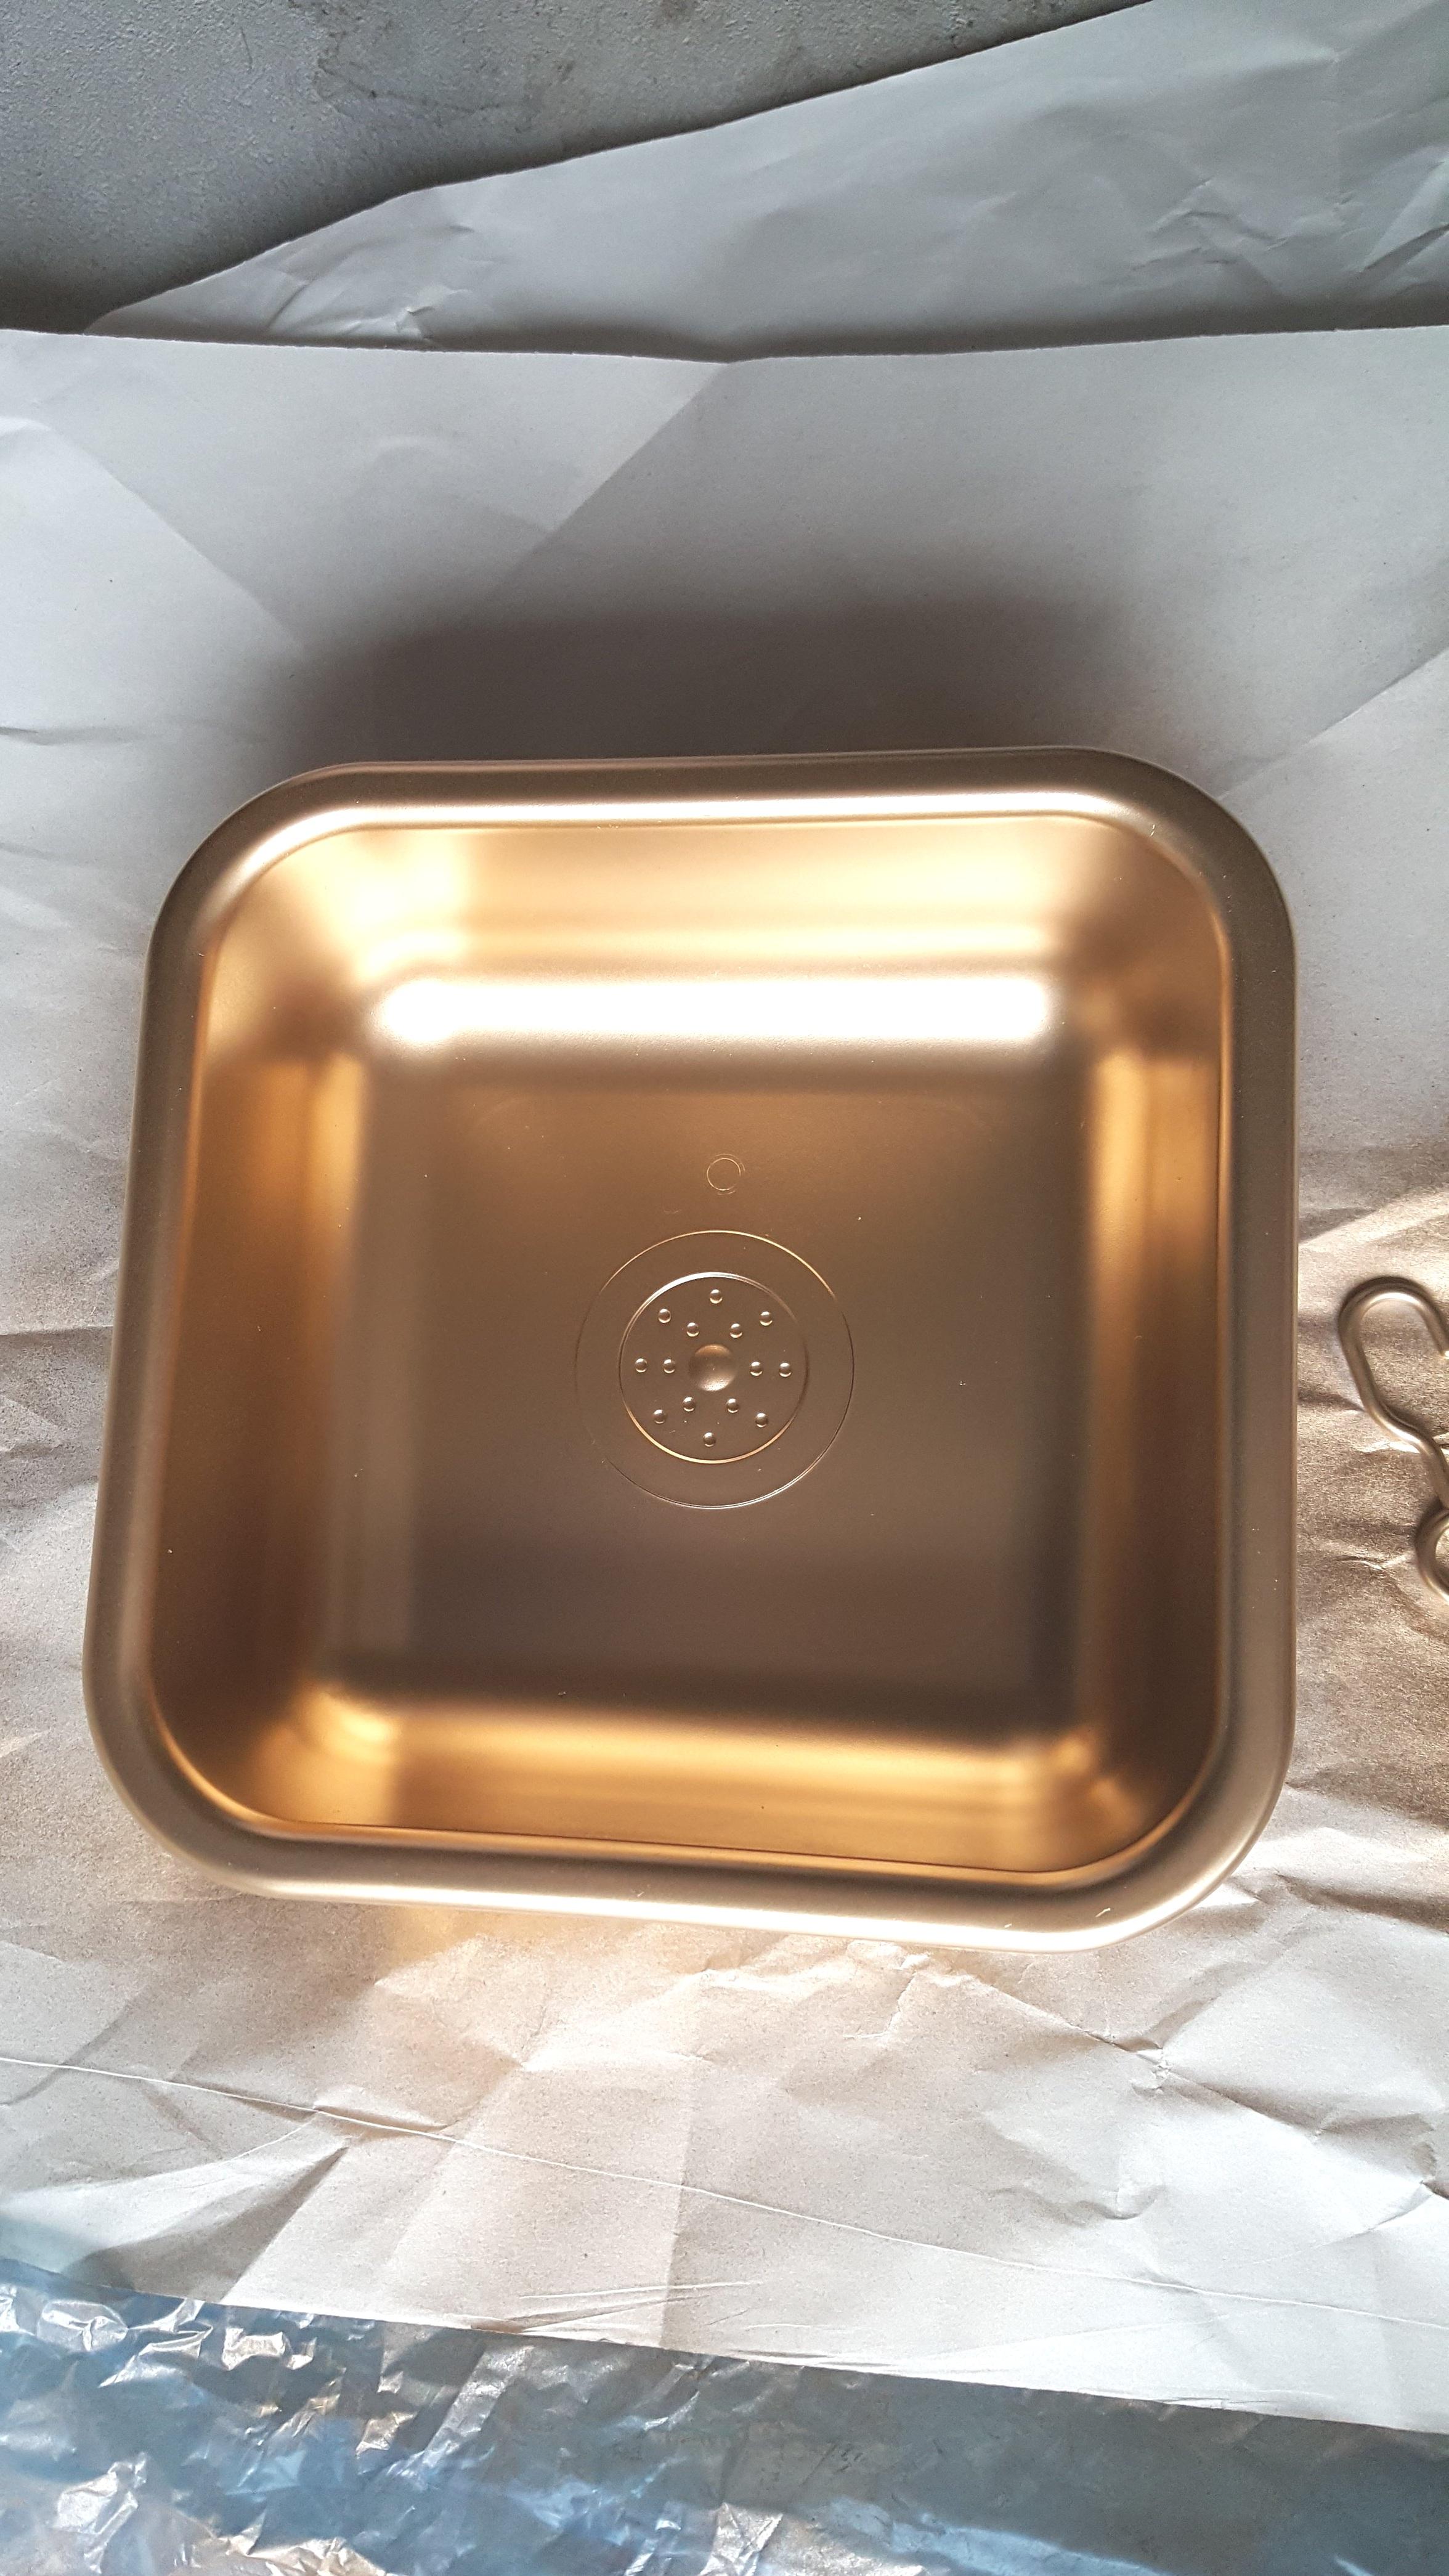 Spraying the sink gold